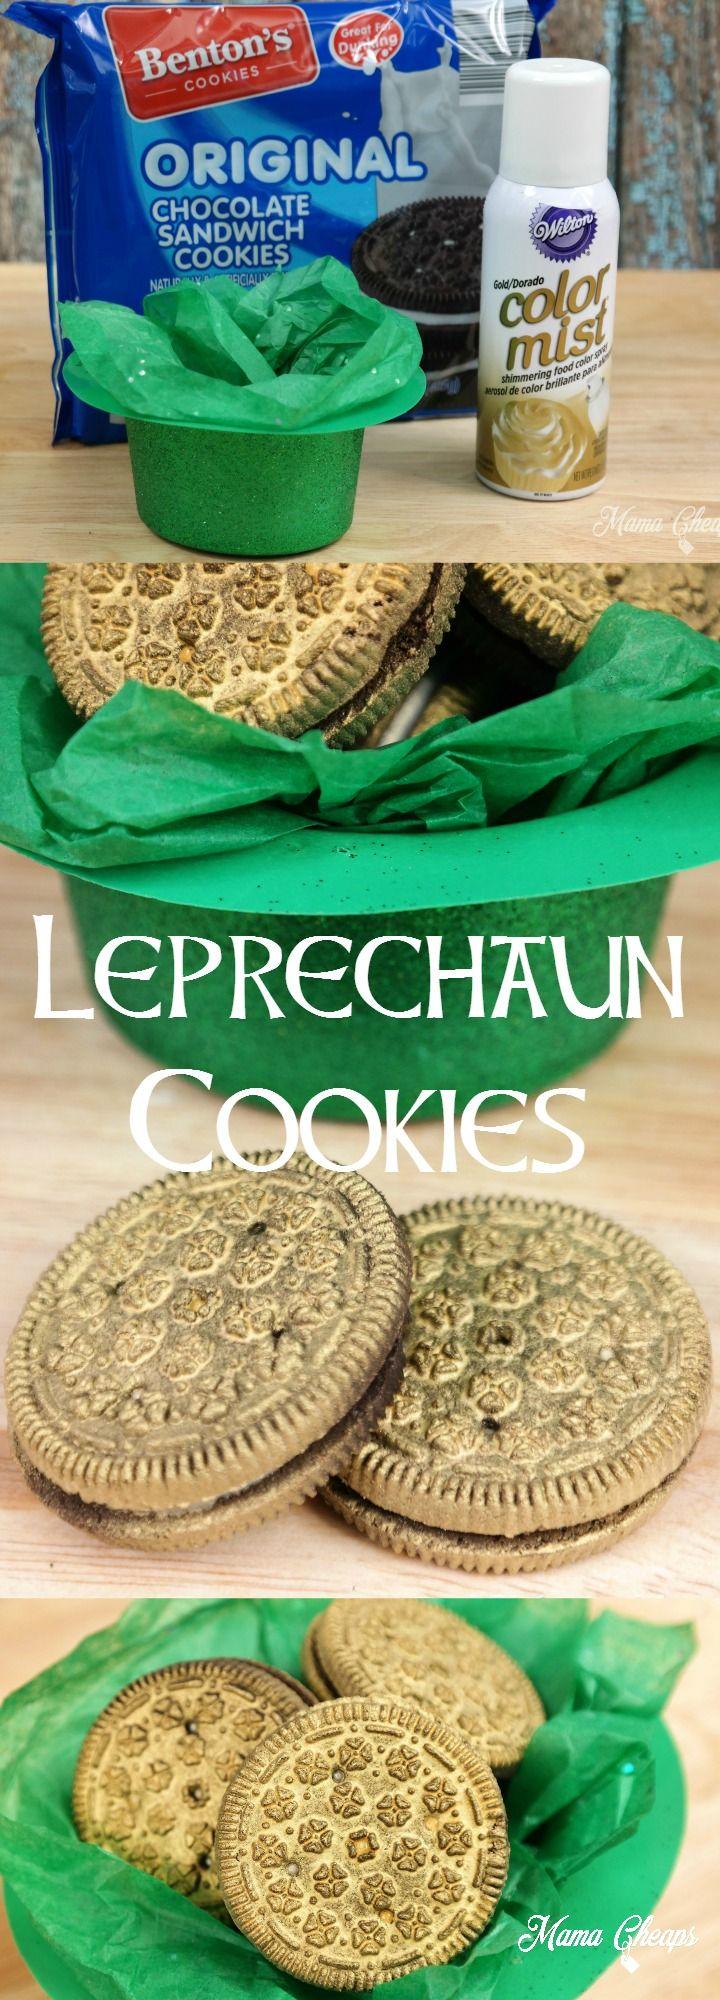 How to Make Leprechaun Cookies   St. Patrick's Day Leprechaun Trick